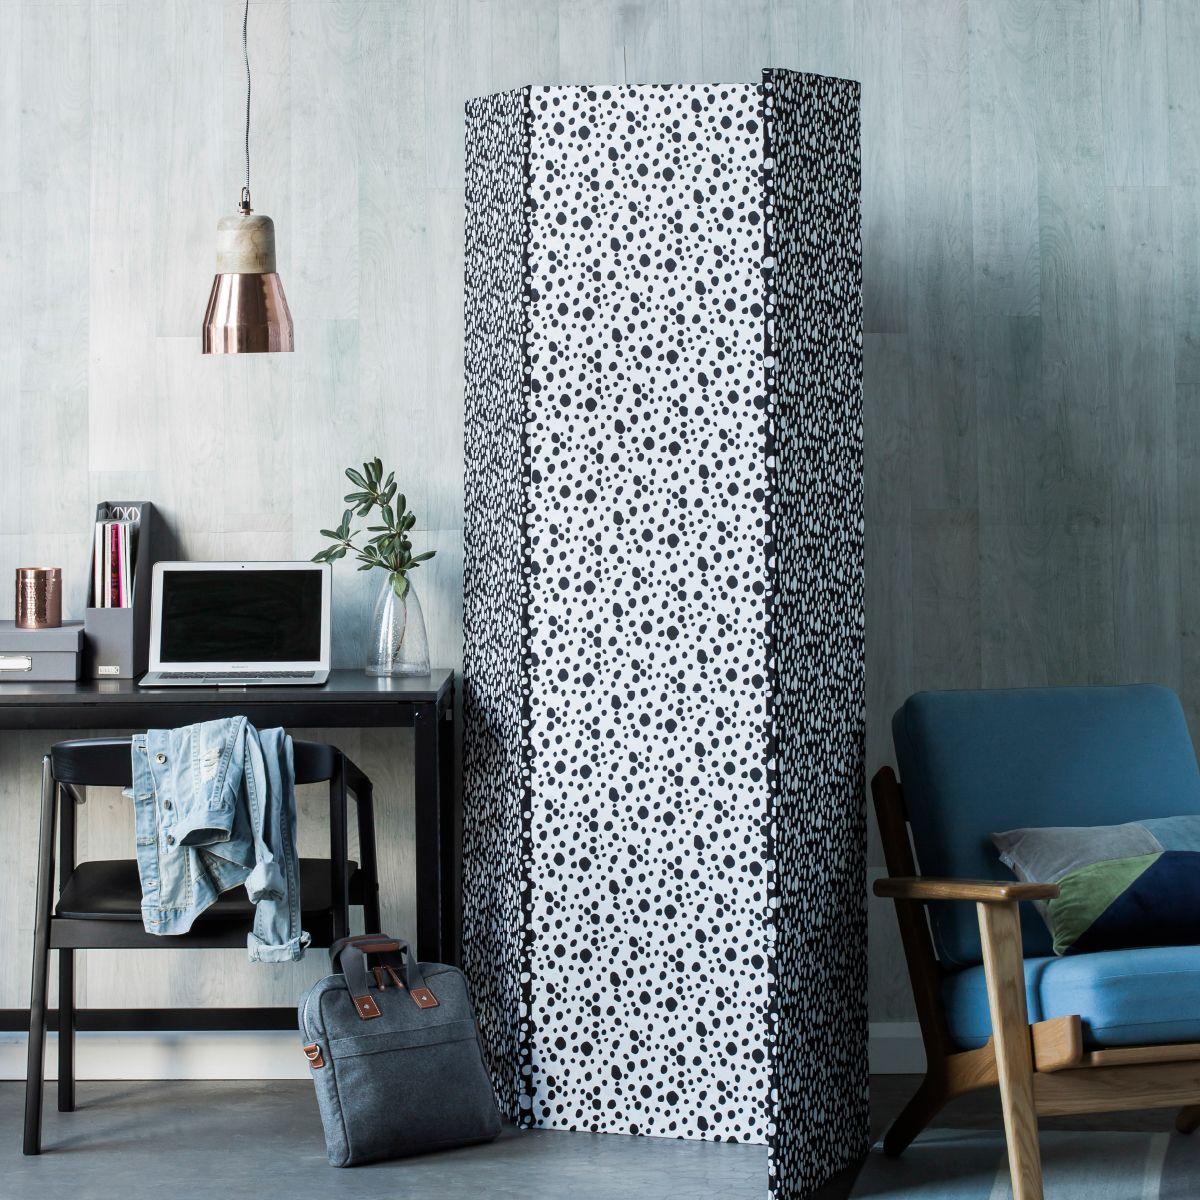 Fabriccovered room divider diy homesplusmag easy diy projects